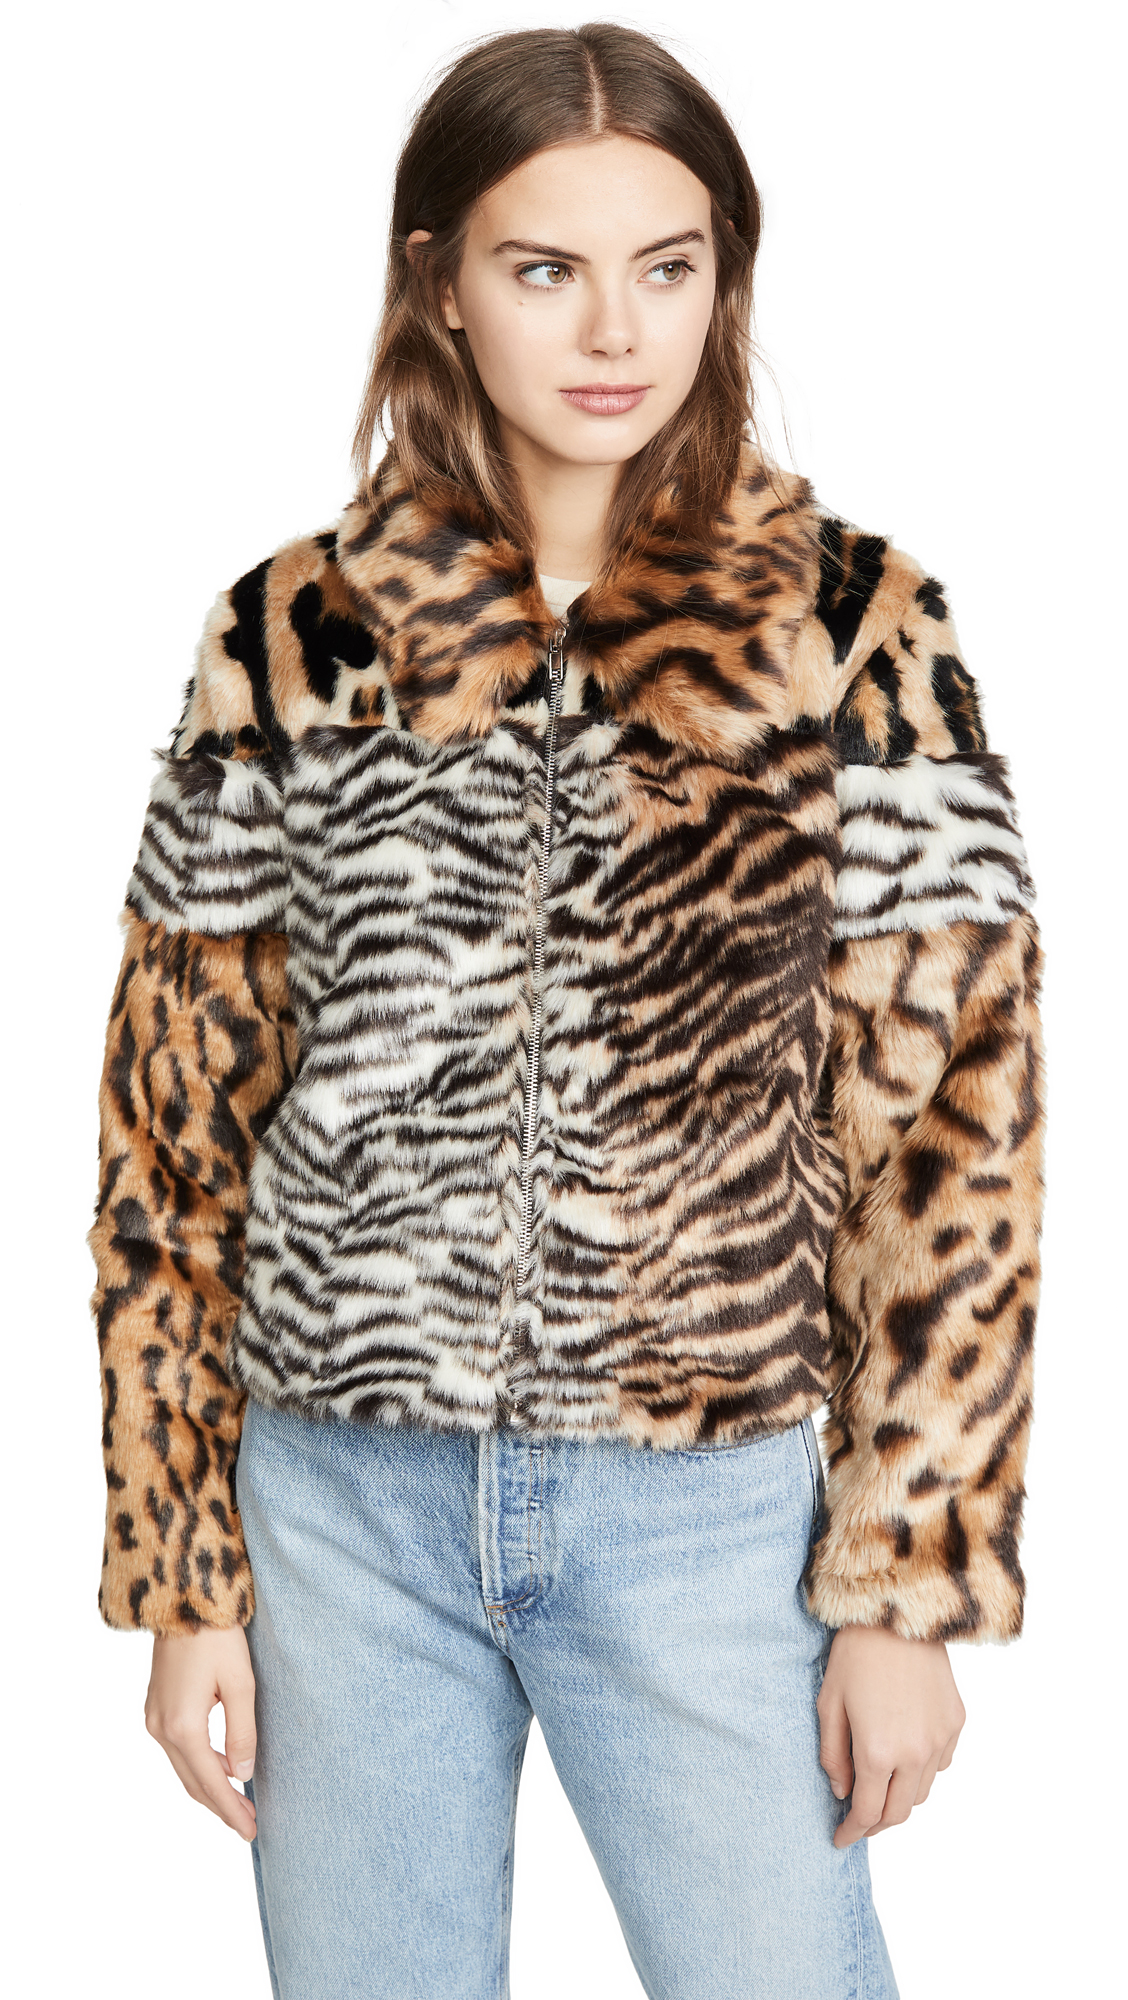 Buy KENDALL + KYLIE Studio 54 Faux Fur Jacket online beautiful KENDALL + KYLIE Jackets, Coats, Down Jackets